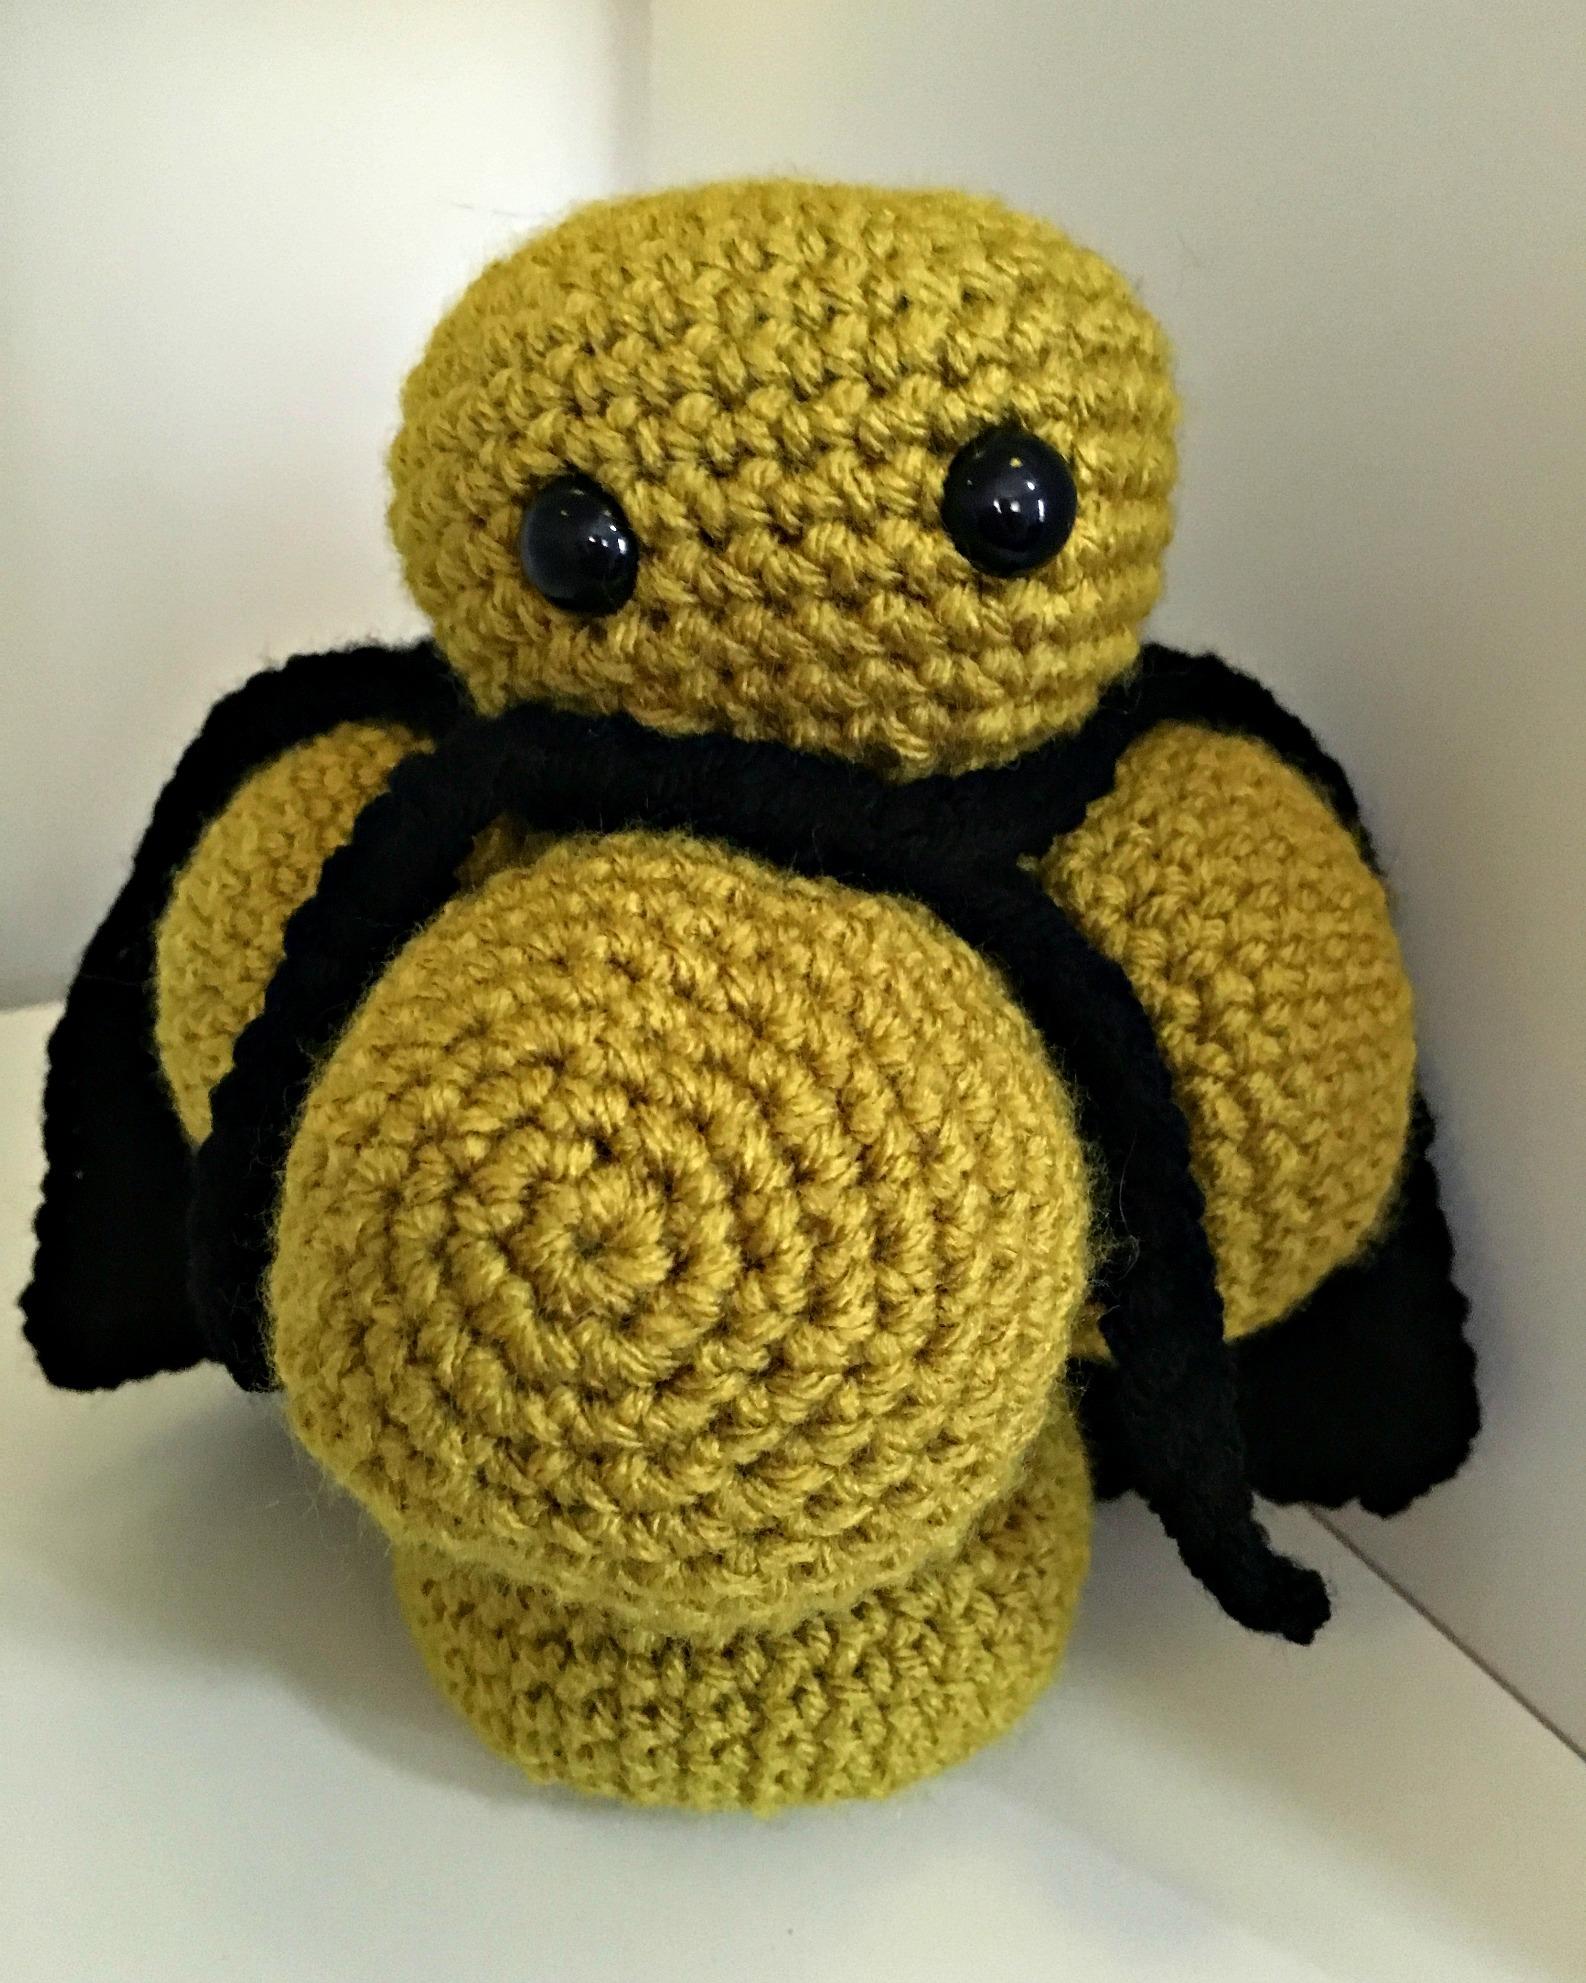 Free Crochet Pattern – Mr. Sa – the Superbug, MRSA